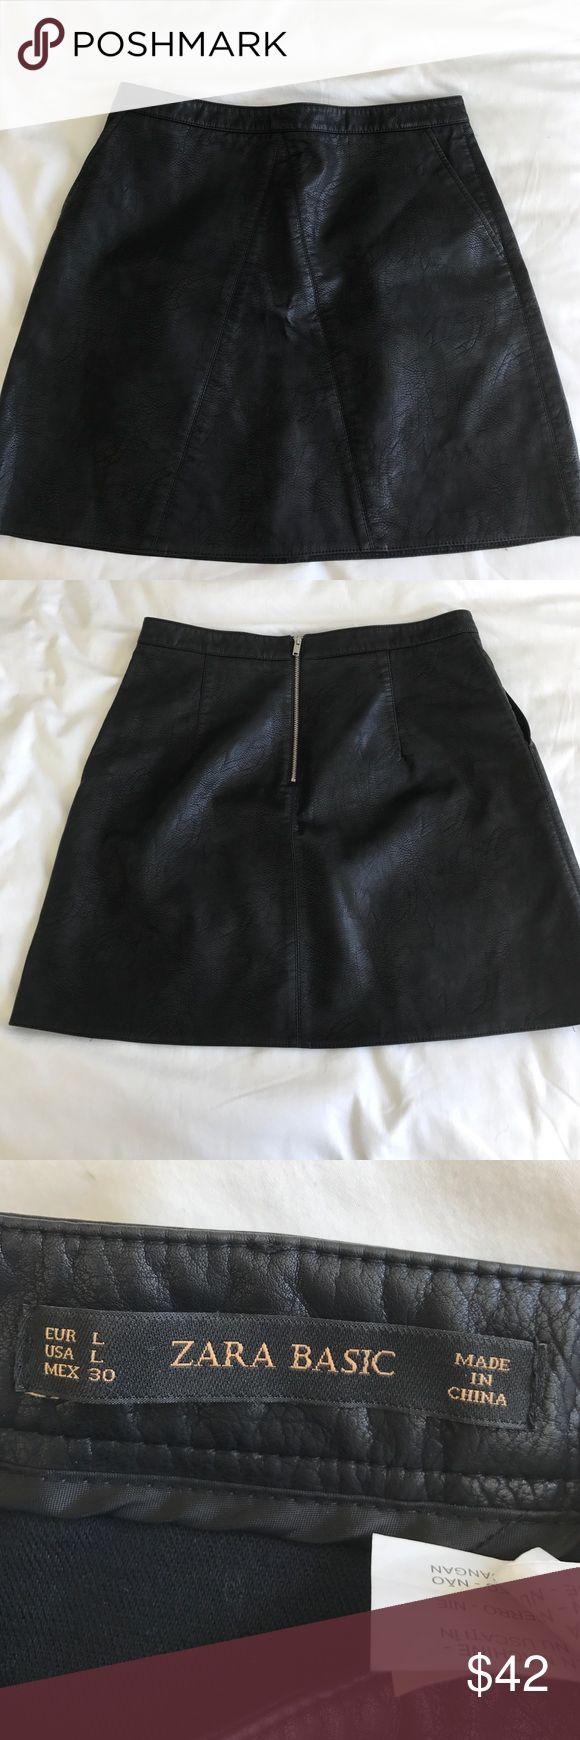 Zara PU Future Leather A Line Skirt size Large Zara Future Leather A Line Skirt size Large and with cute pockets! never worn. Zara Skirts Mini